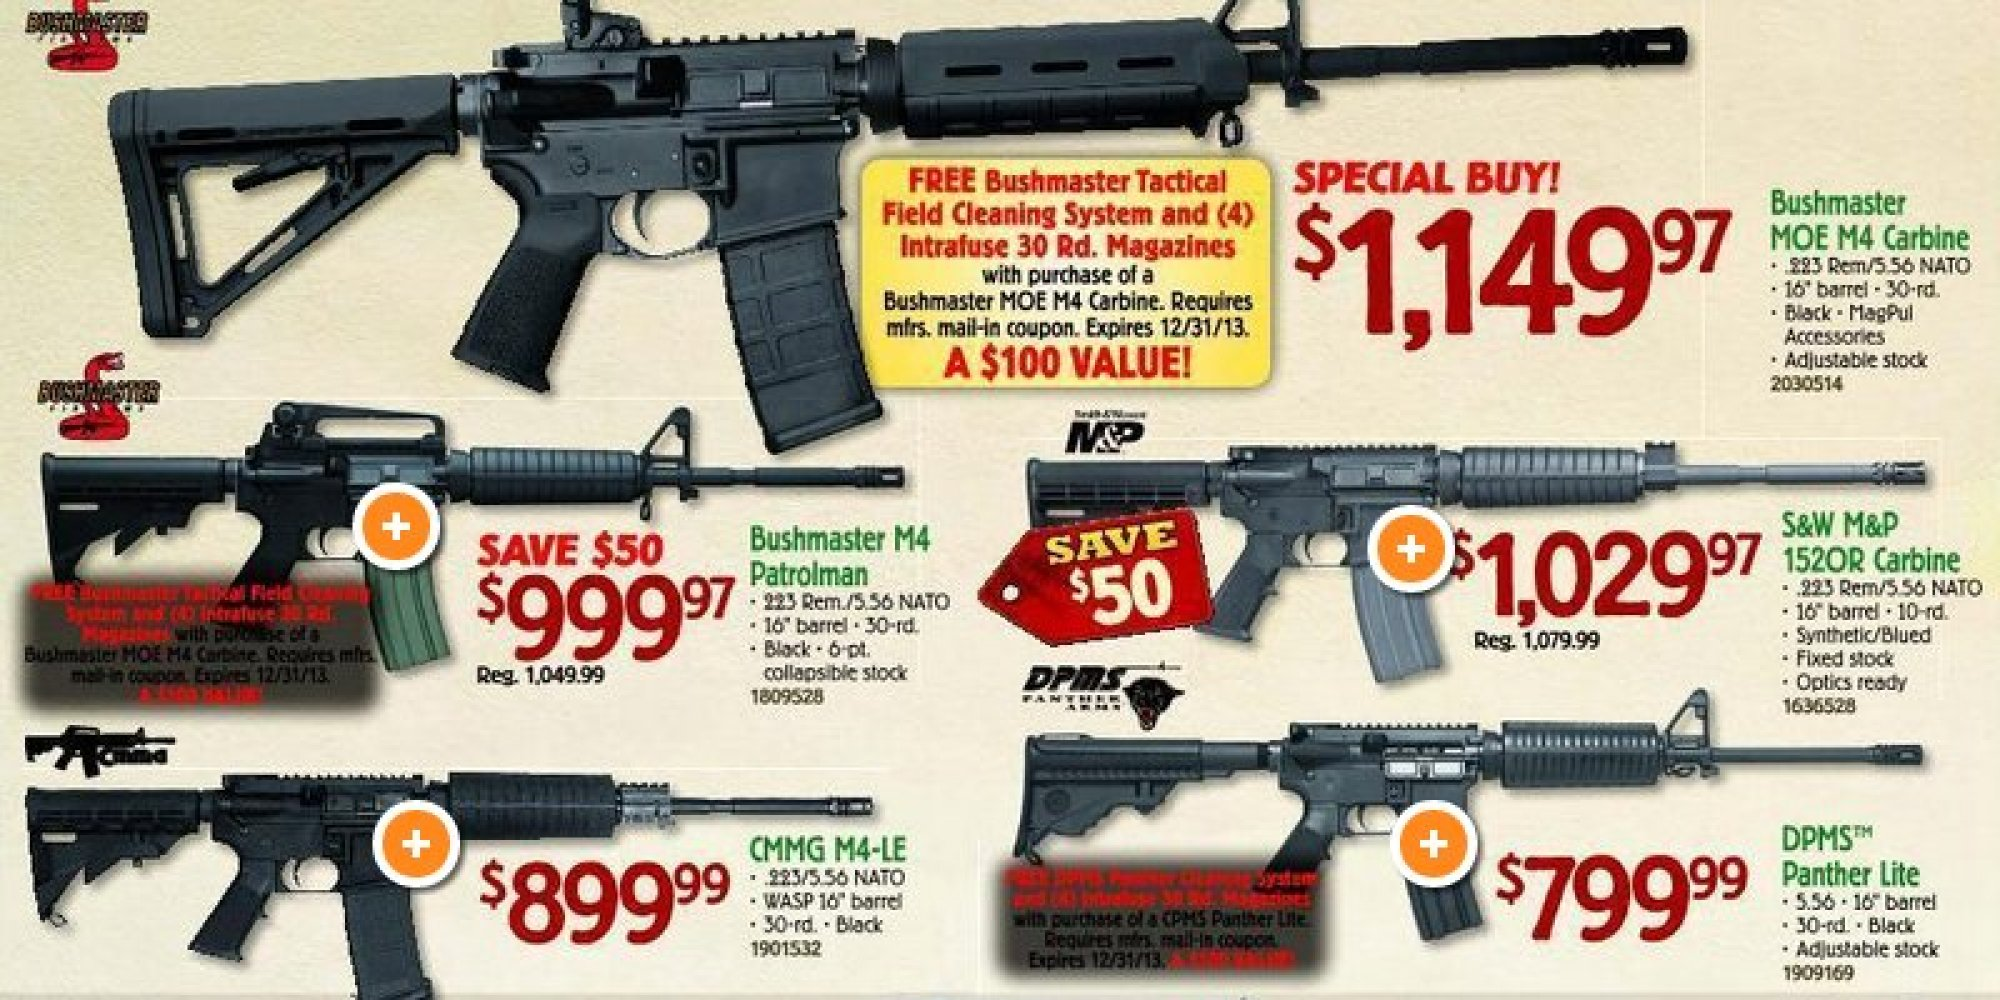 bass pro shops guns for sale - Bass Pro After Christmas Sale